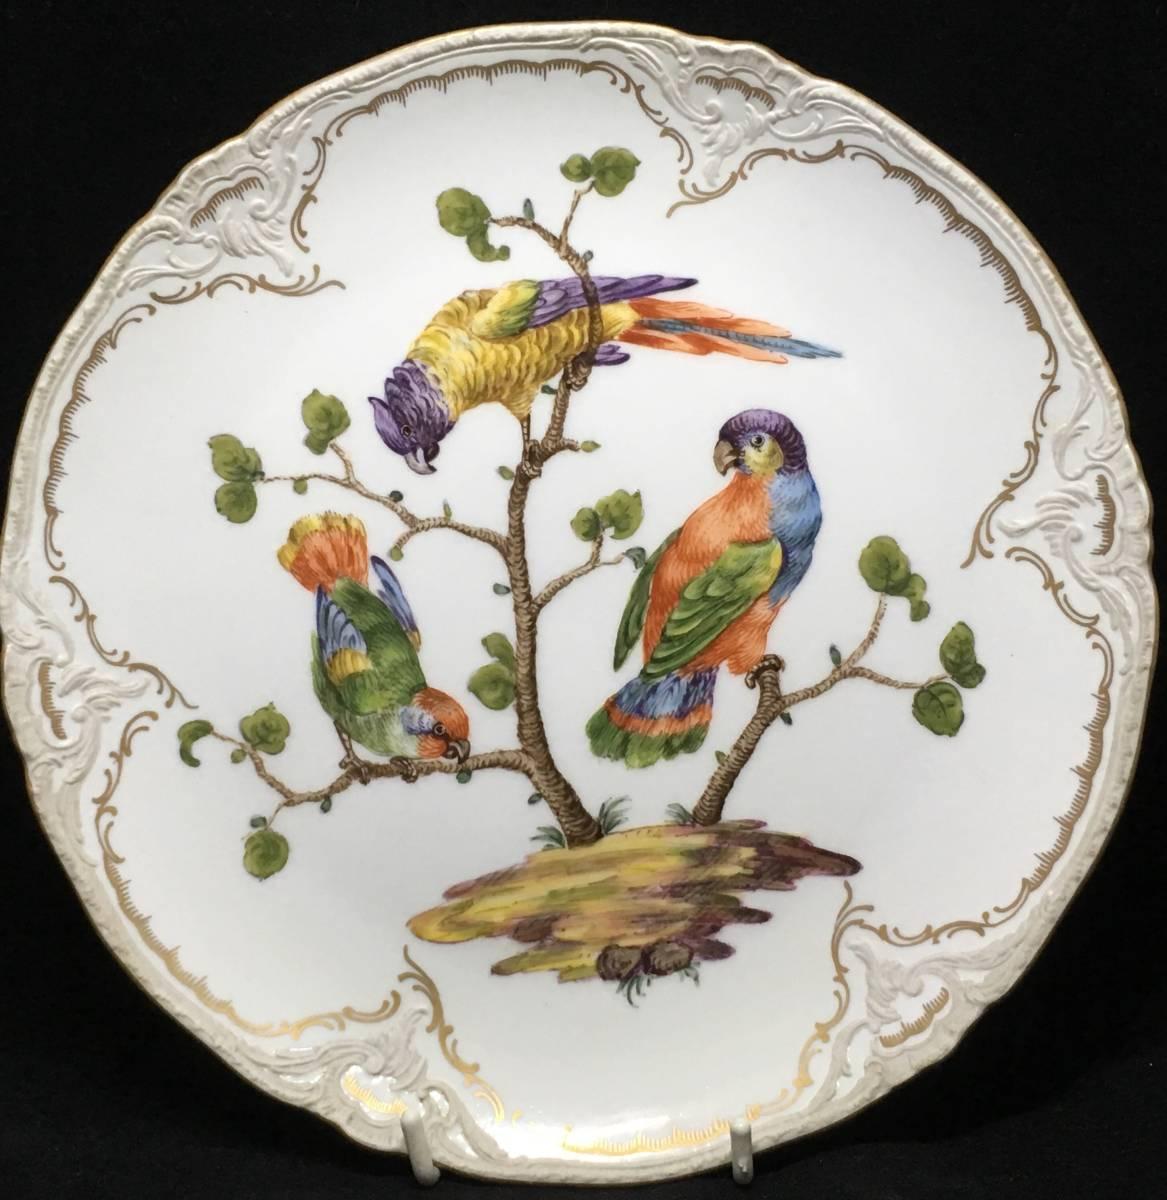 KPM窯・繊細最上級絵付3羽鳥図飾皿!陽刻彫・ハンドペイント!19世紀